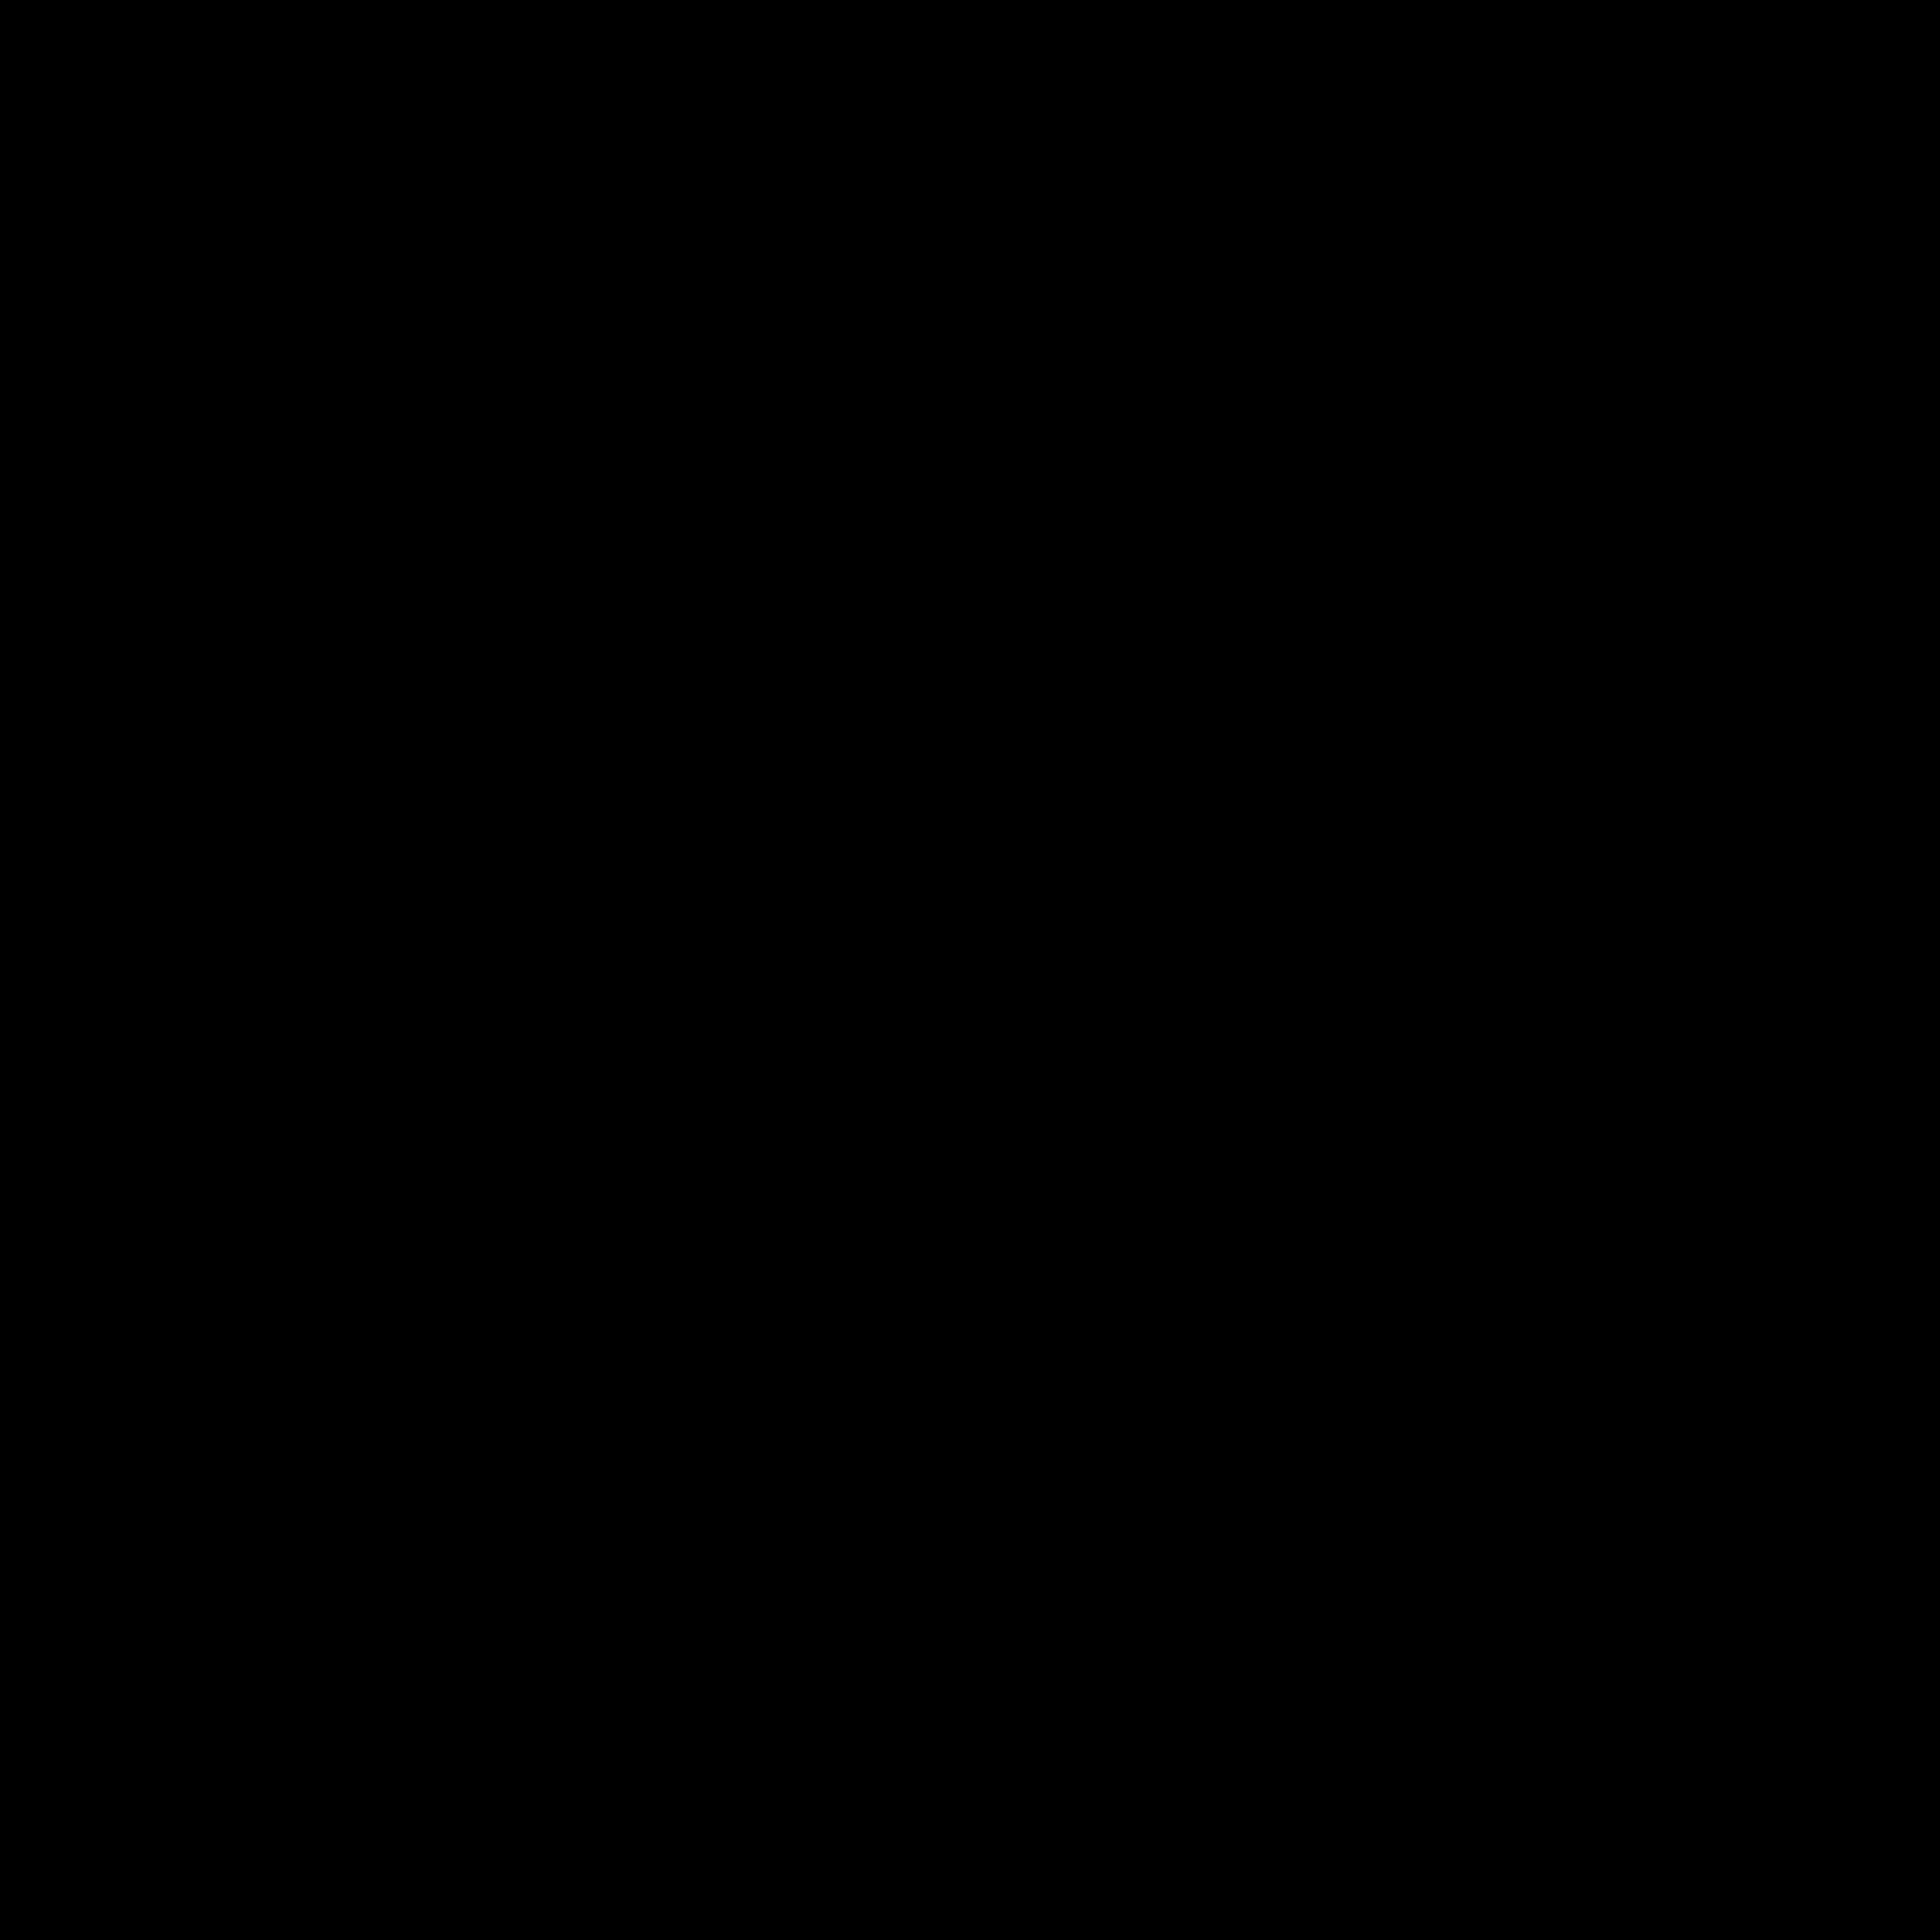 Circle Clipart Cheese 757 Desain Grafis Bingkai Seni Tengkorak